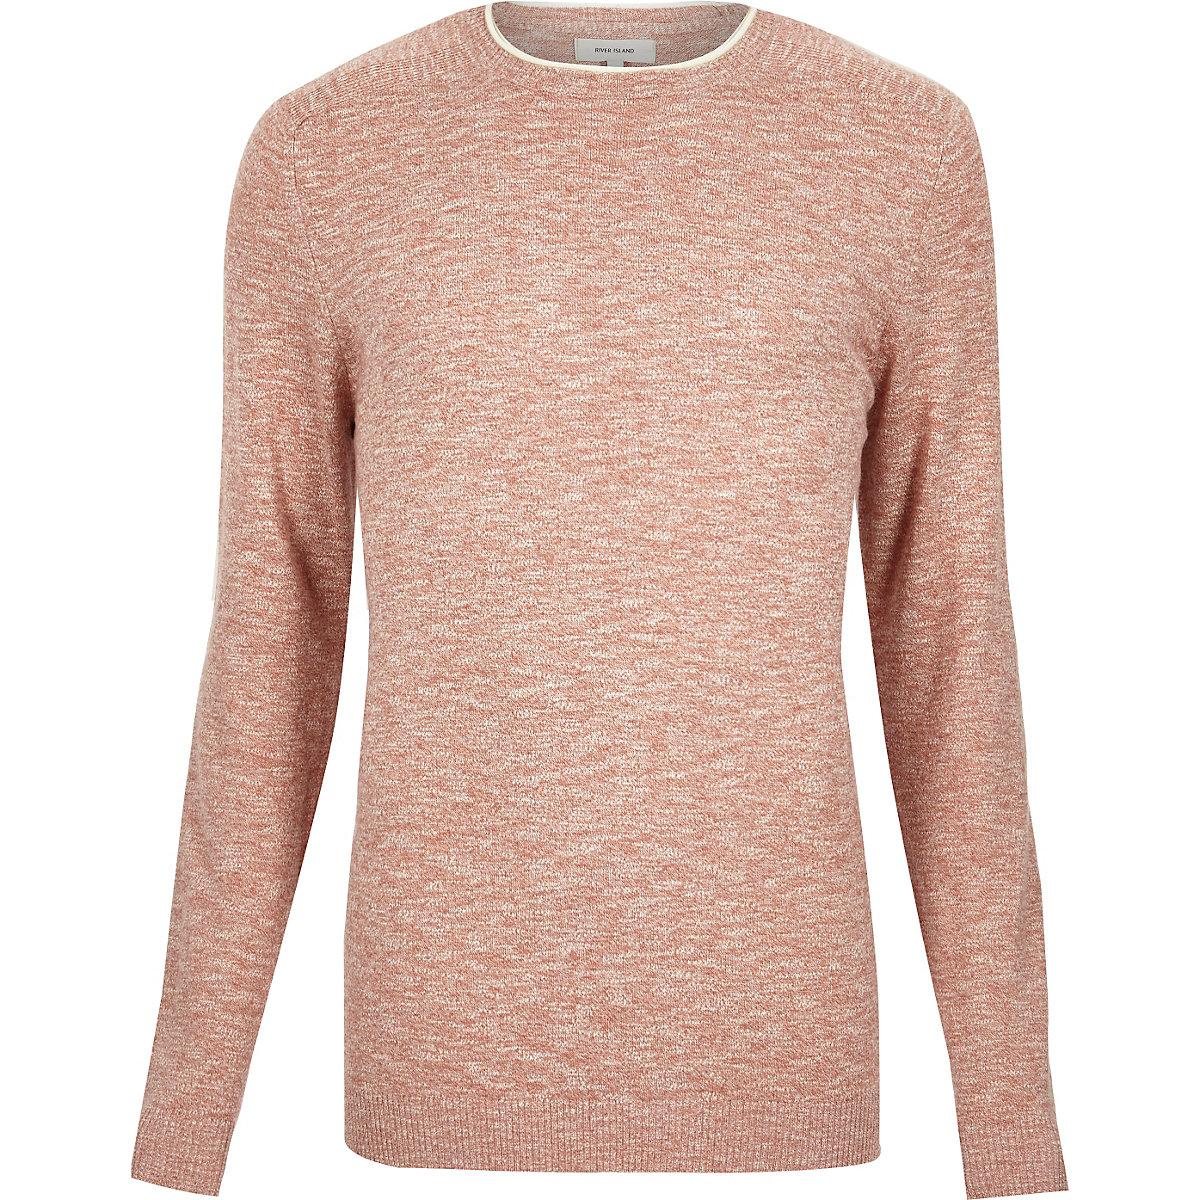 Light red marl crew neck long sleeve sweater